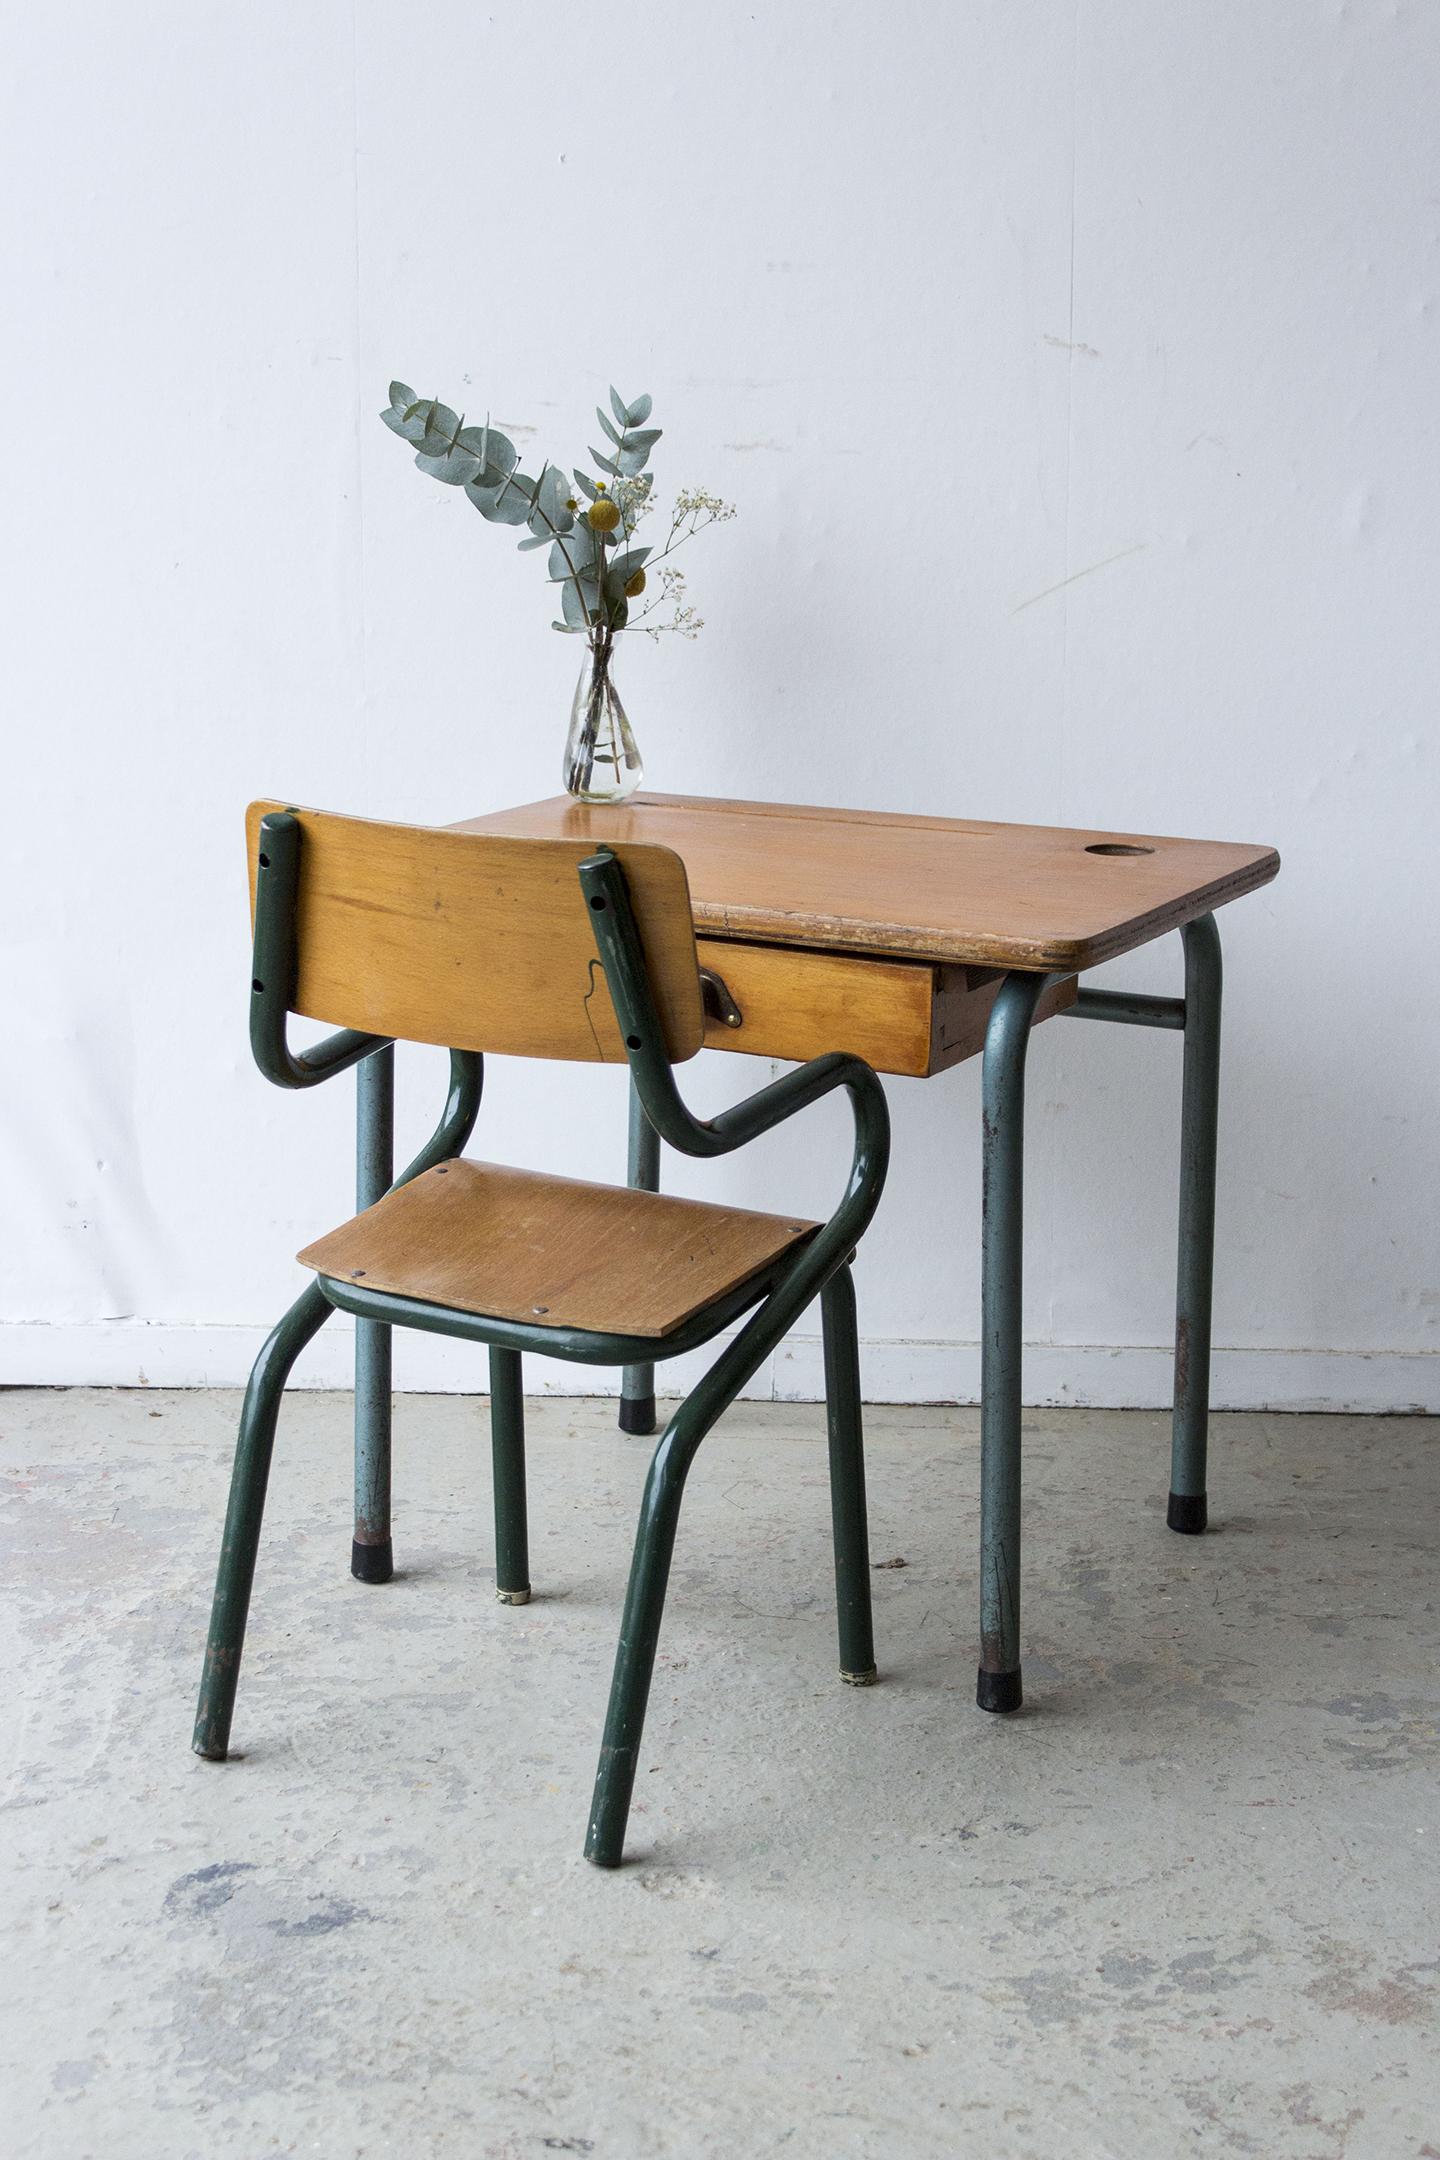 3166 - vintage kleutertafeltje met stoeltje - Firma zoethout_4.jpg